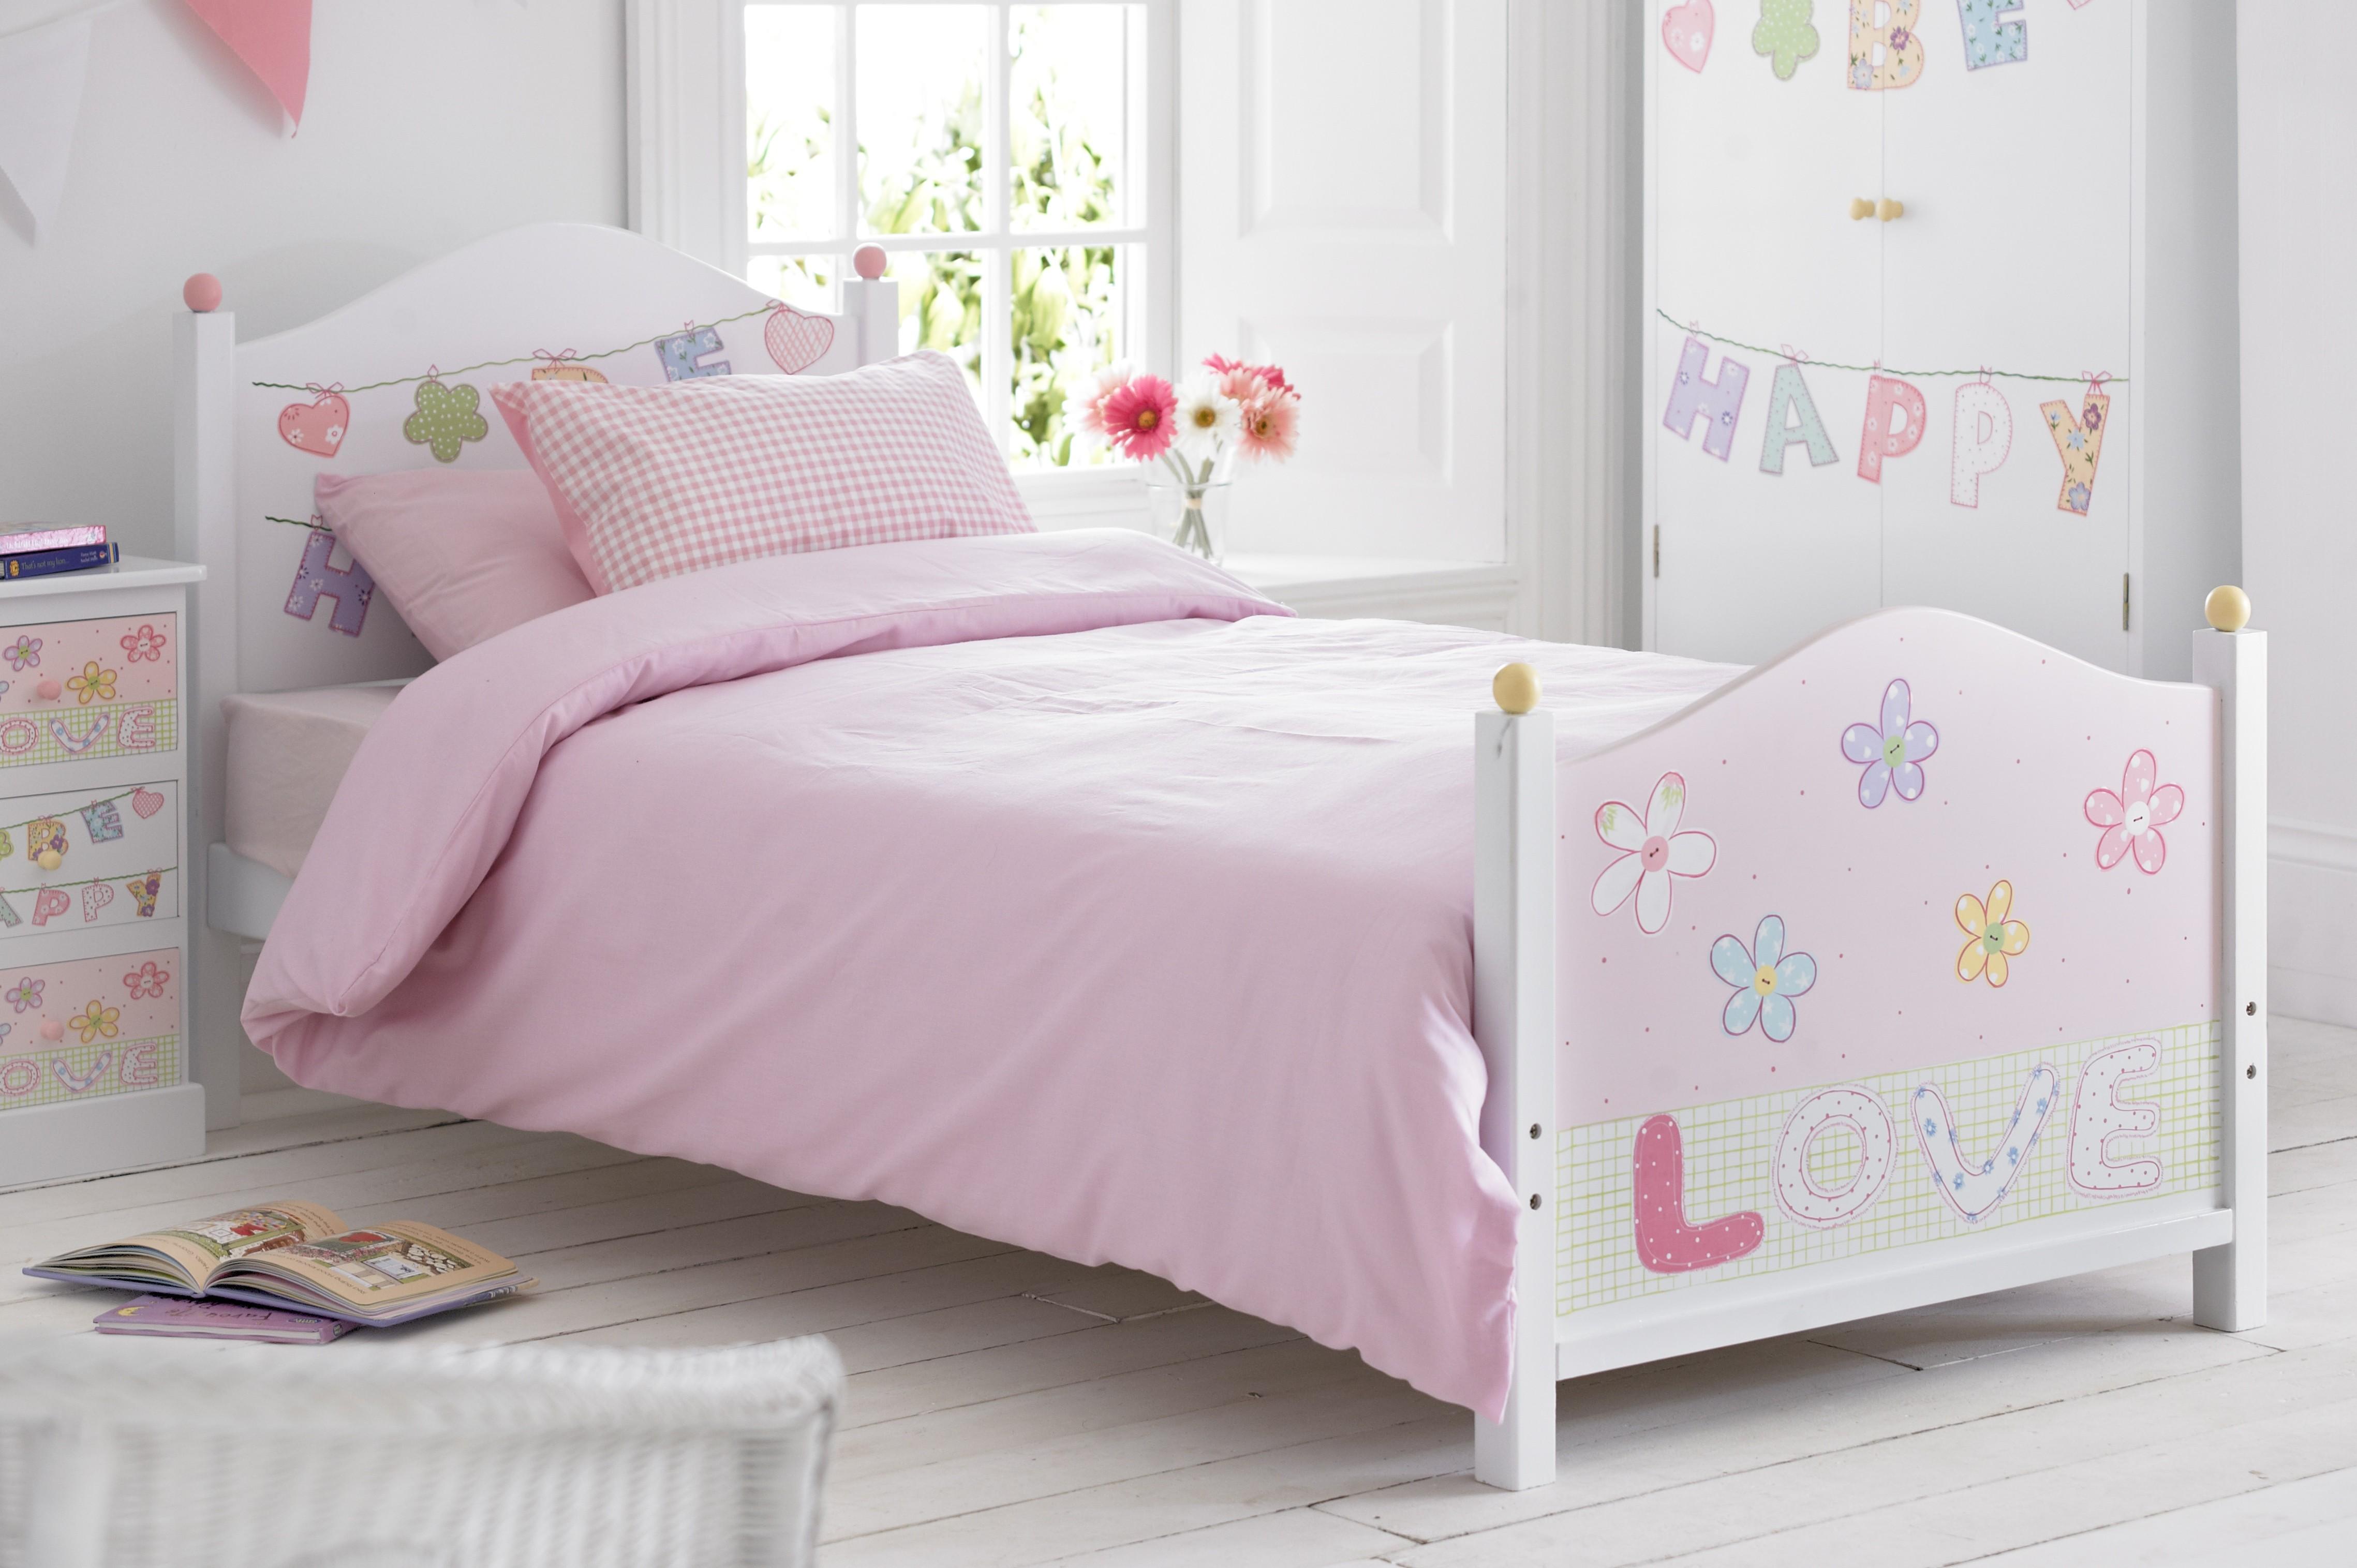 affordable bedroom furniture for girls photo - 10